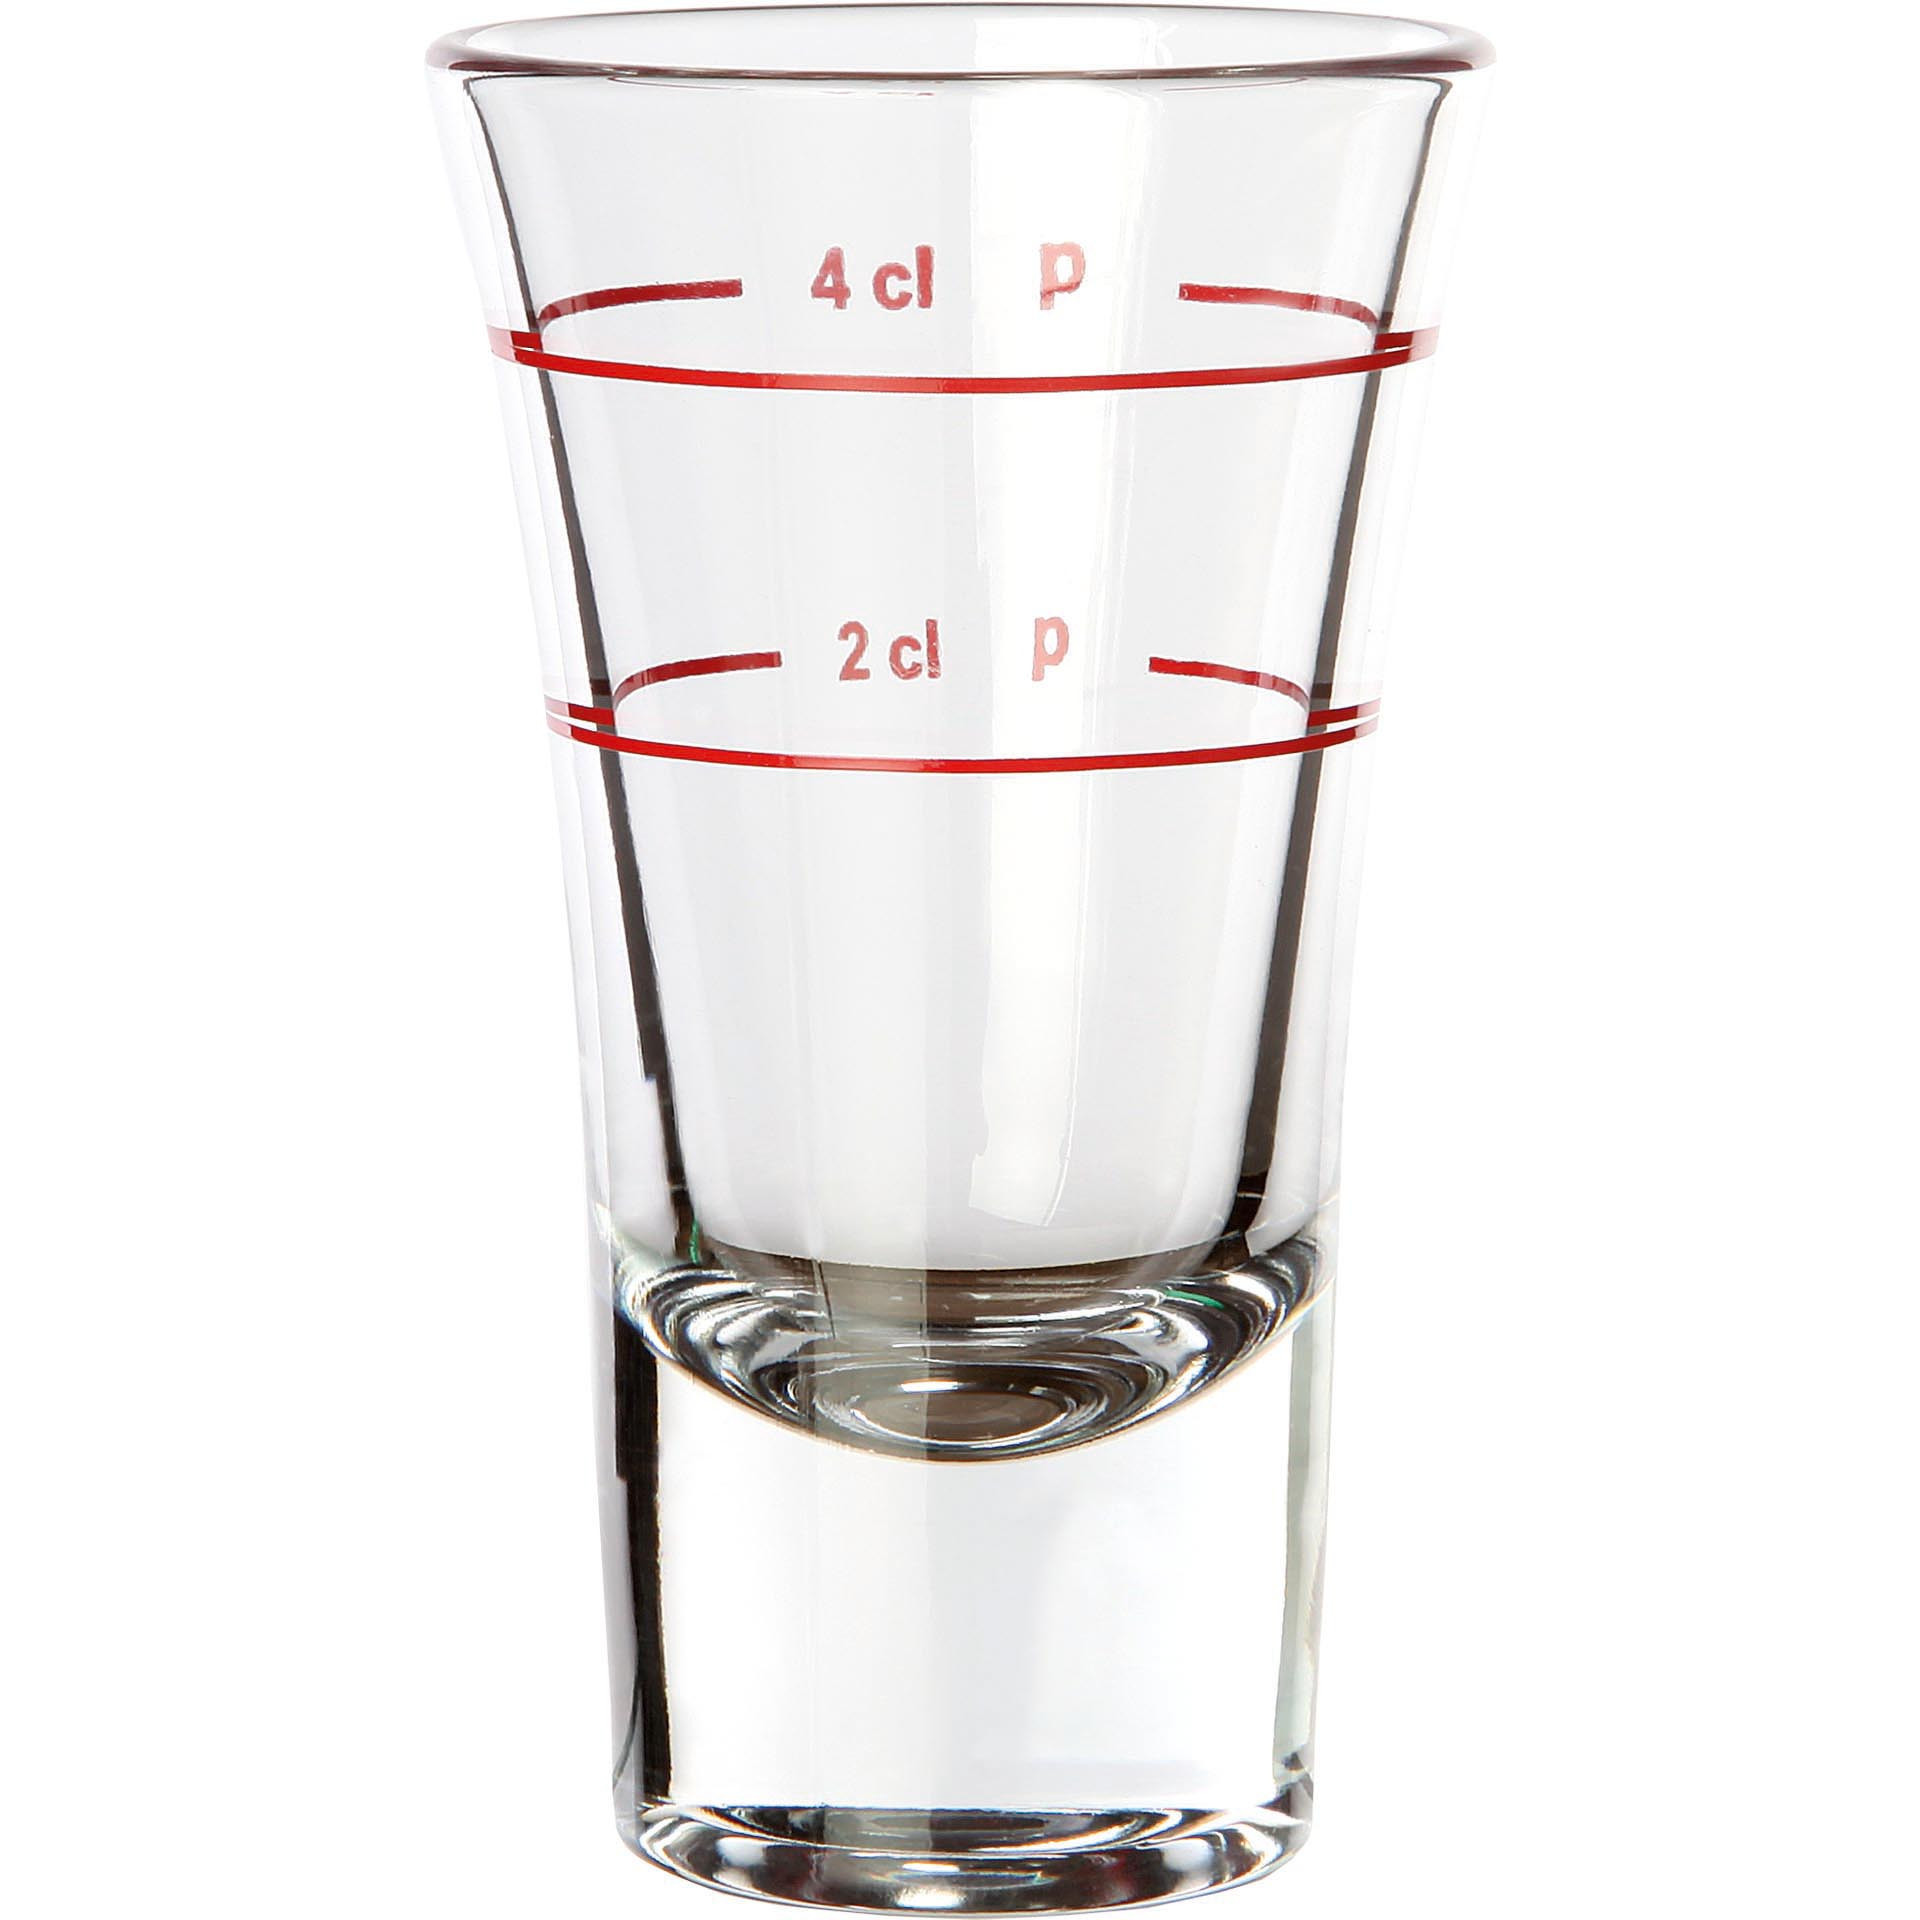 Schnapsglas 1 Cl